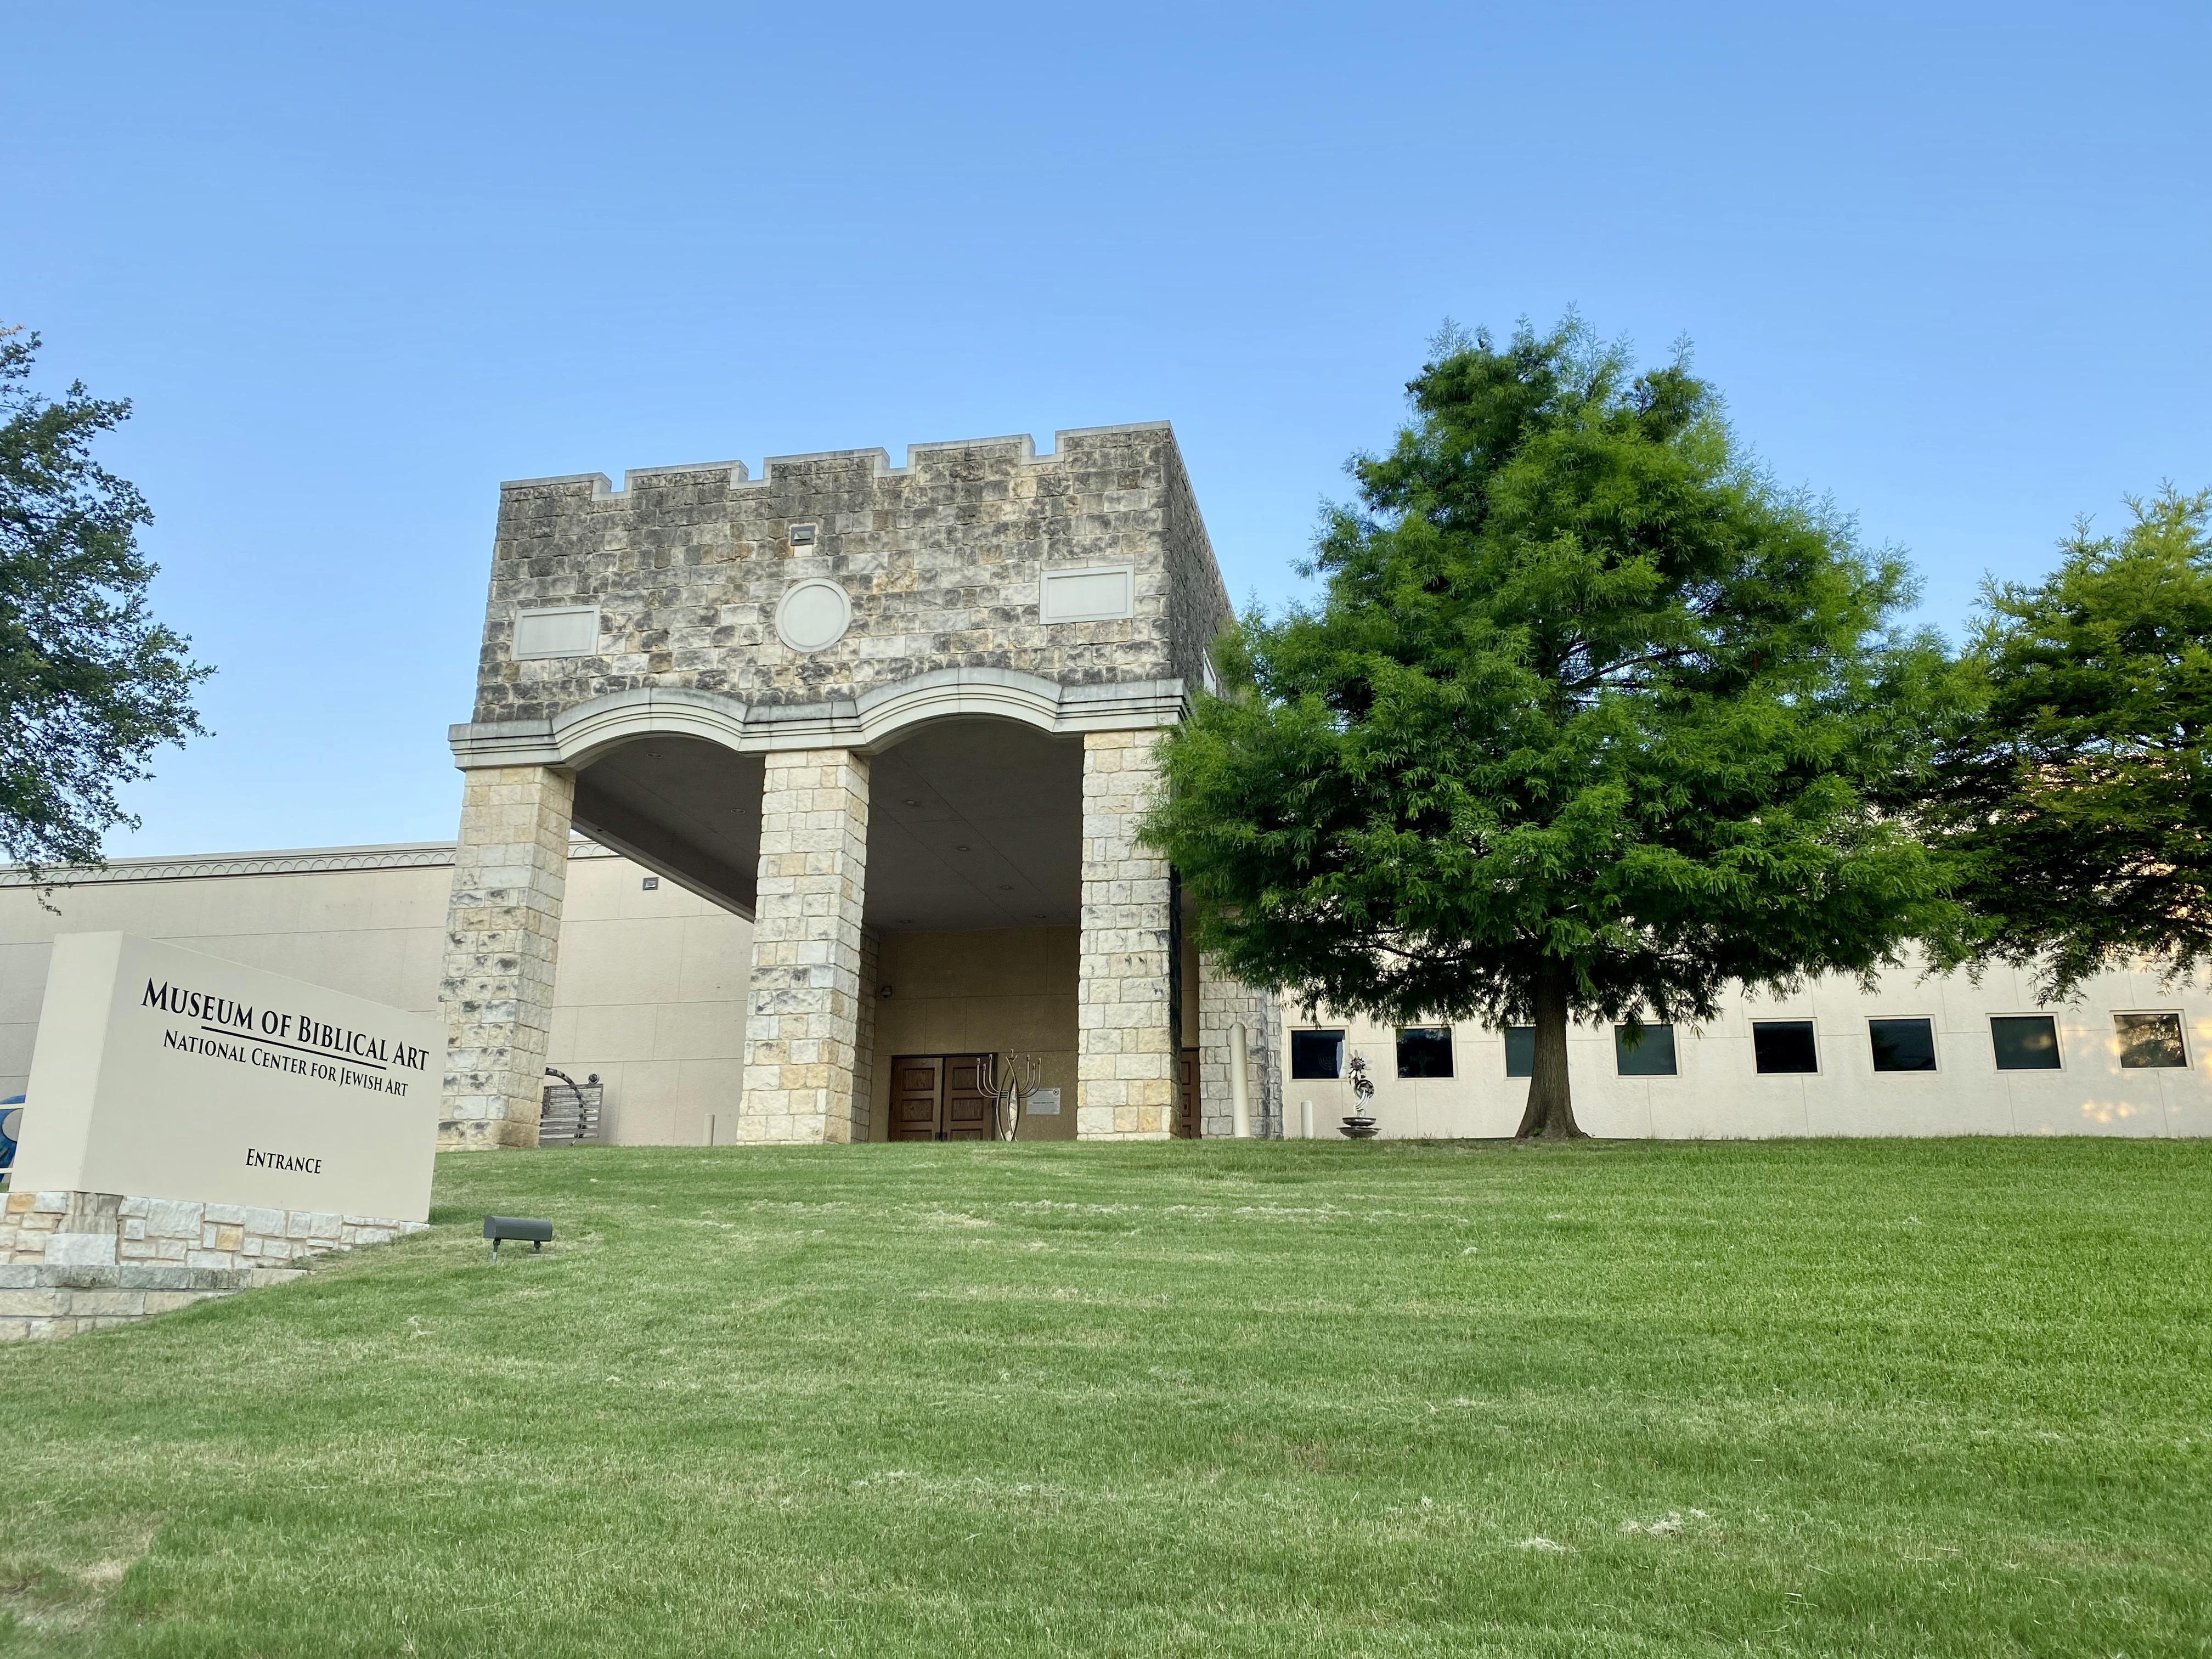 Museum of Biblical Art in North Dallas, TX